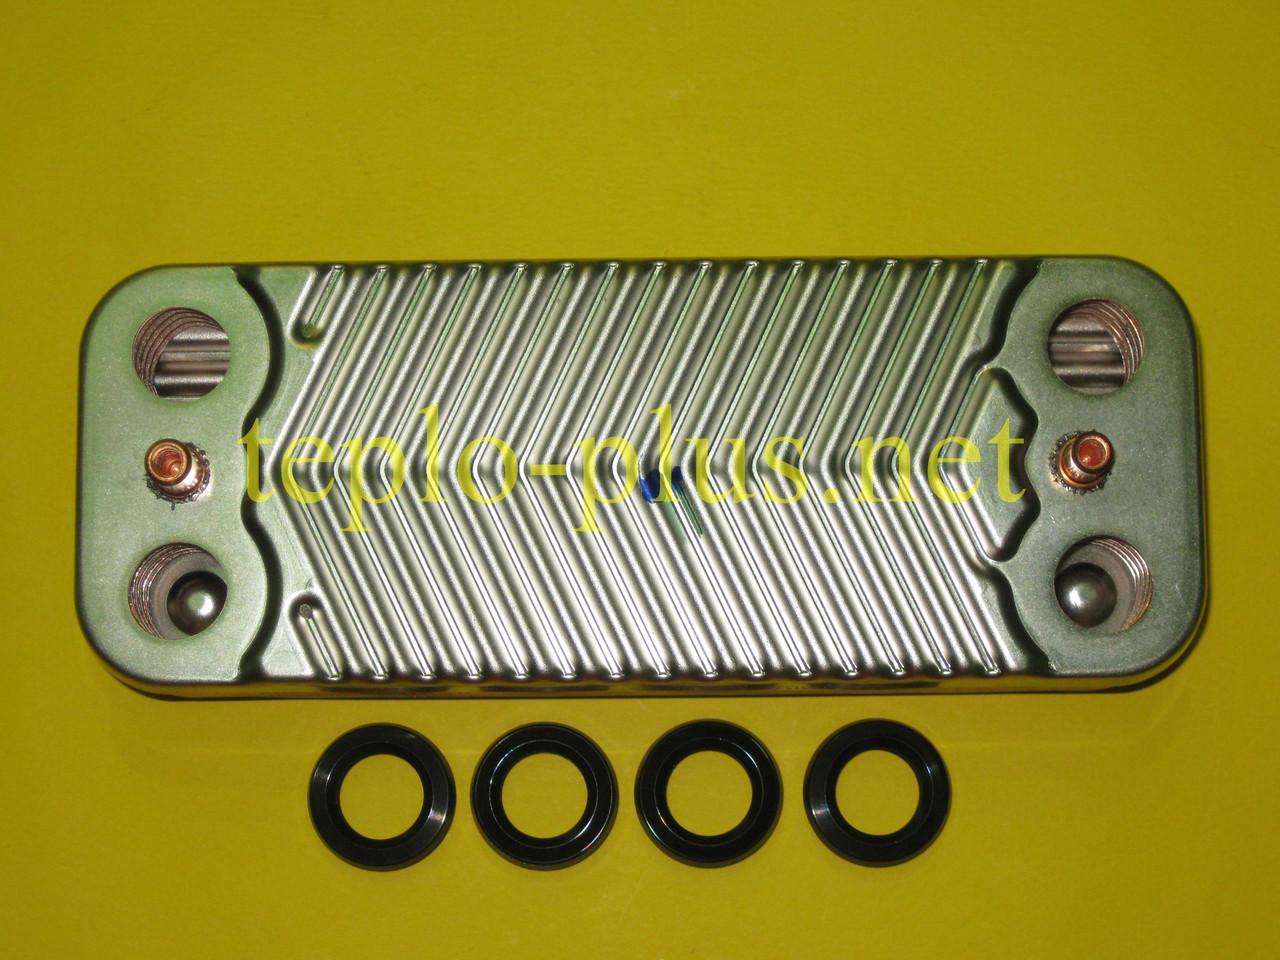 Теплообменник вторичный 3.021692 Immergas Nike Mini 24 3E, Eolo Mini 24 3E, фото 2